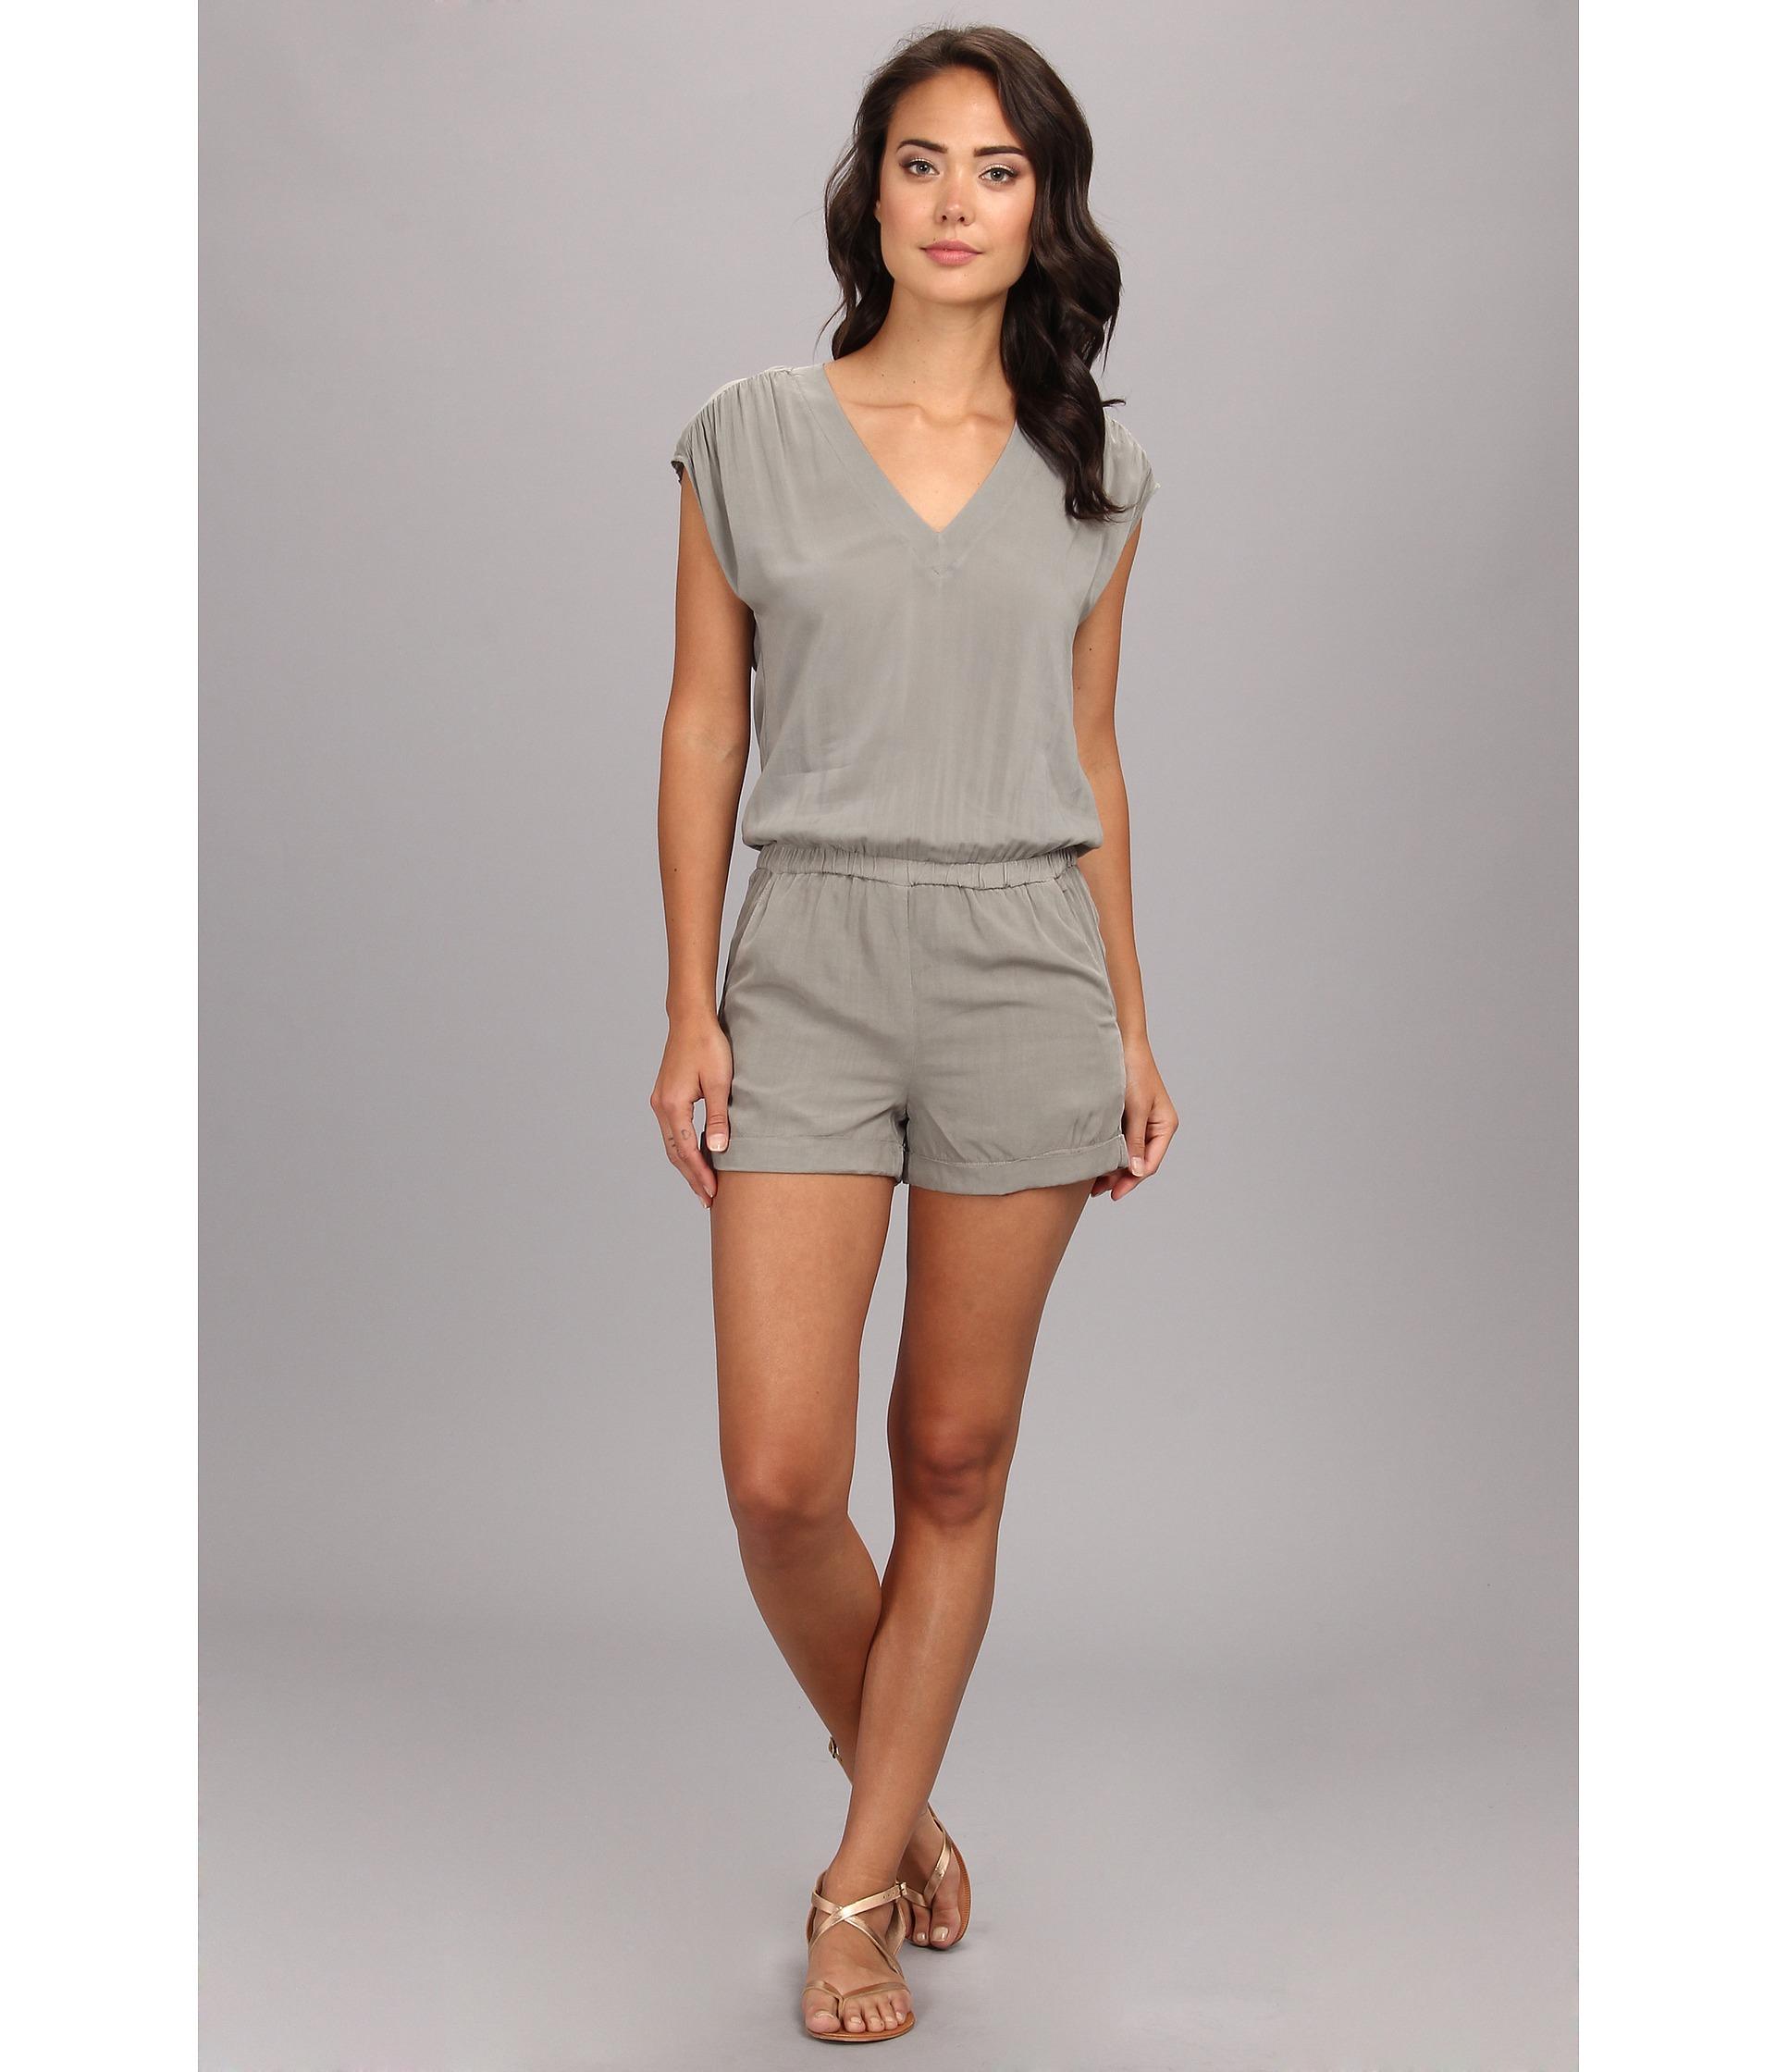 42a6a3158978 Lyst - Splendid Short Romper in Gray